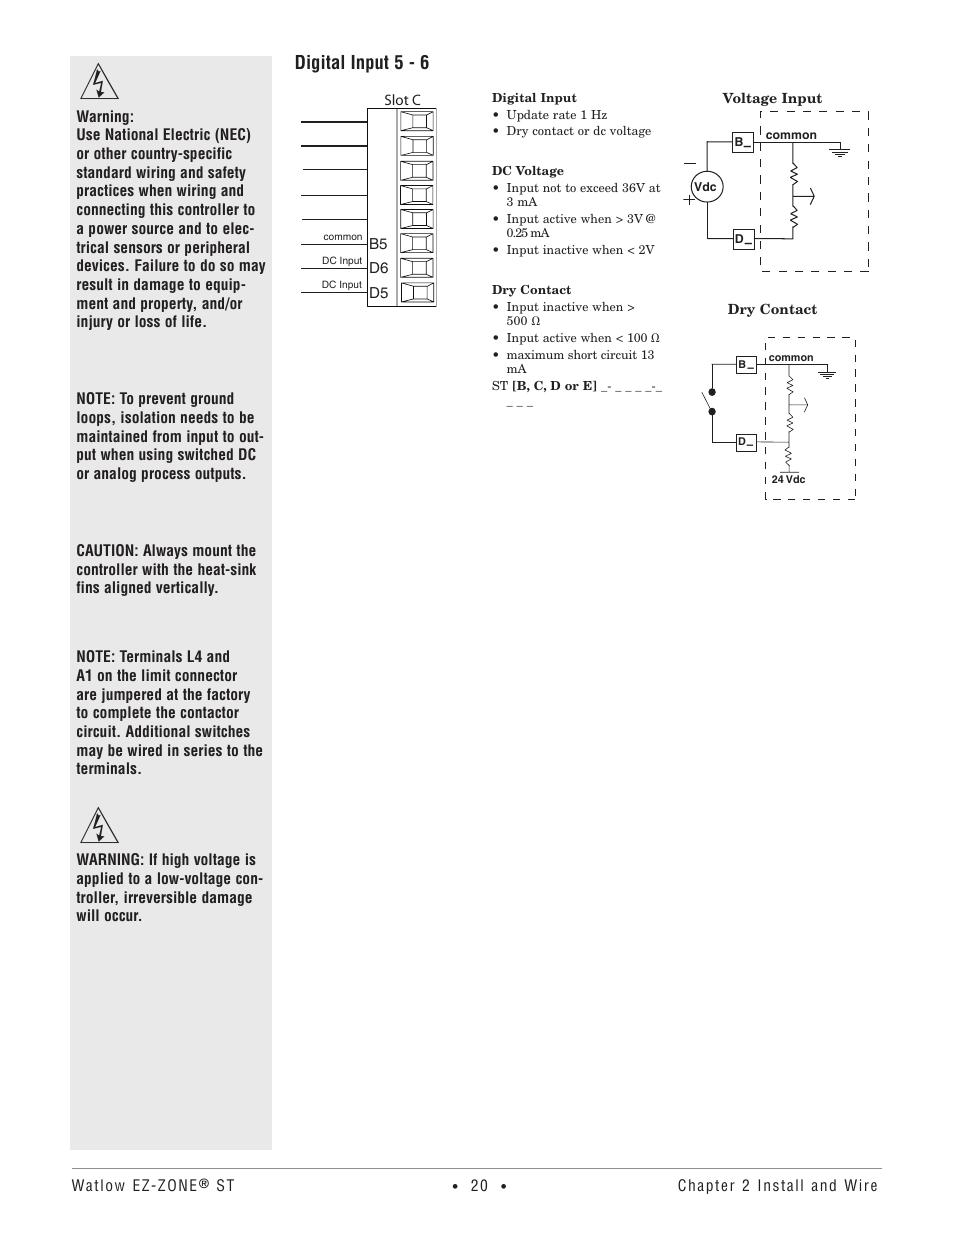 Digital input 5 - 6 | Watlow EZ-ZONE ST User Manual | Page 22